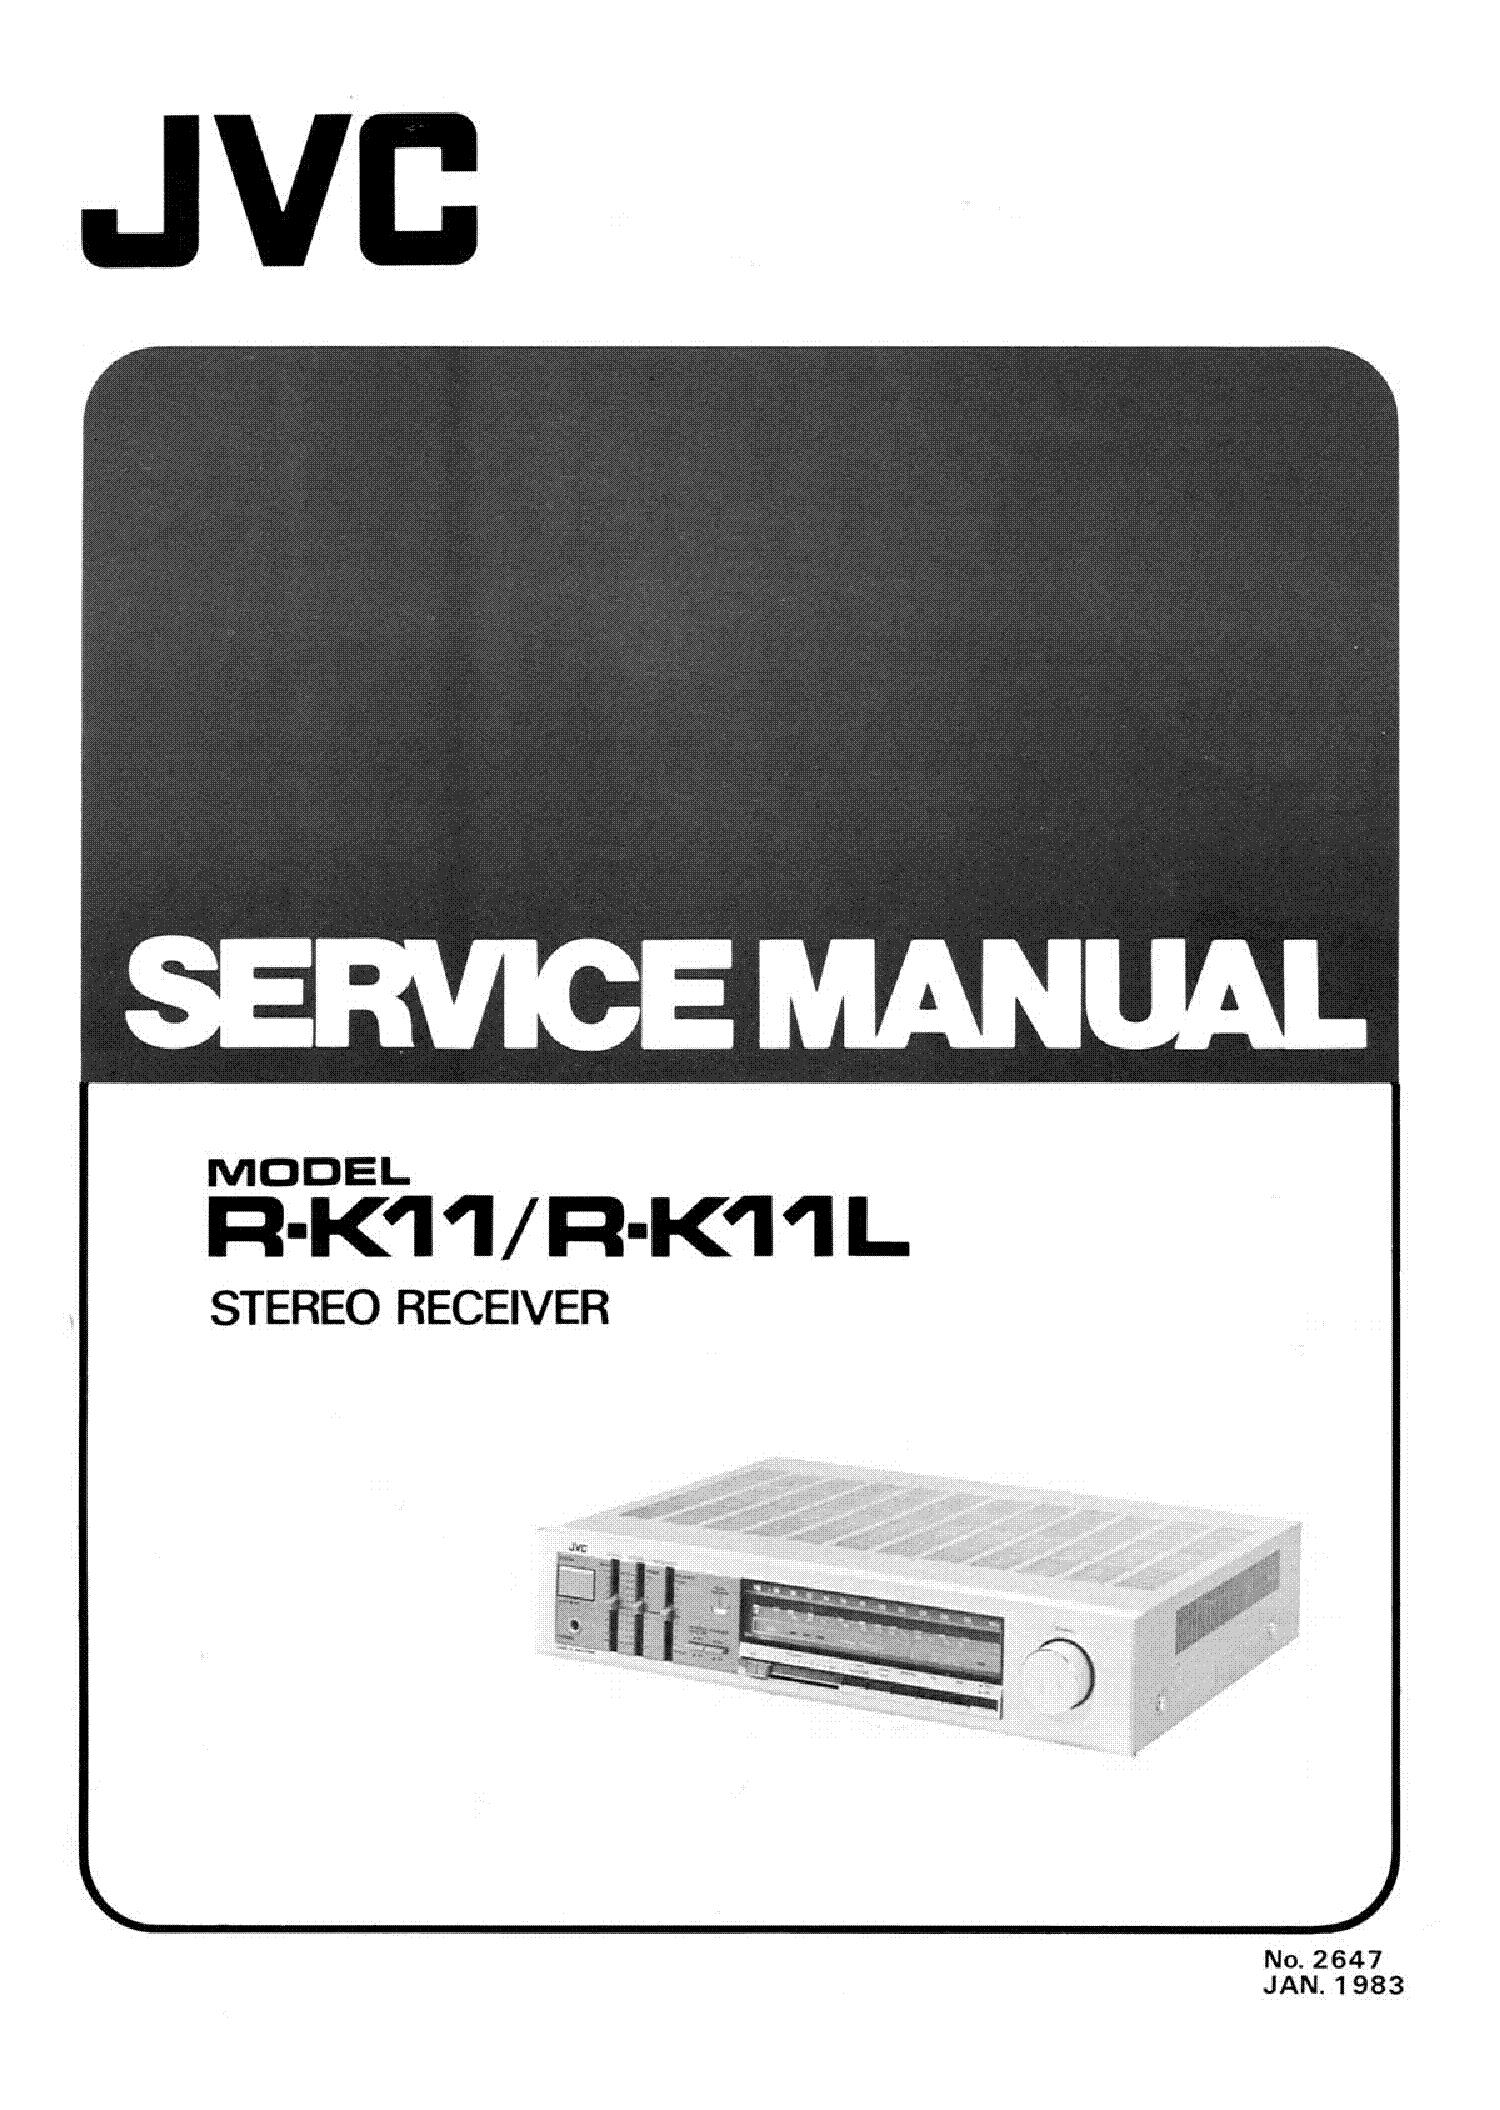 JVC R-K11 R-K11L 2X35W STEREO RECEIVER 1983 SM service manual (1st